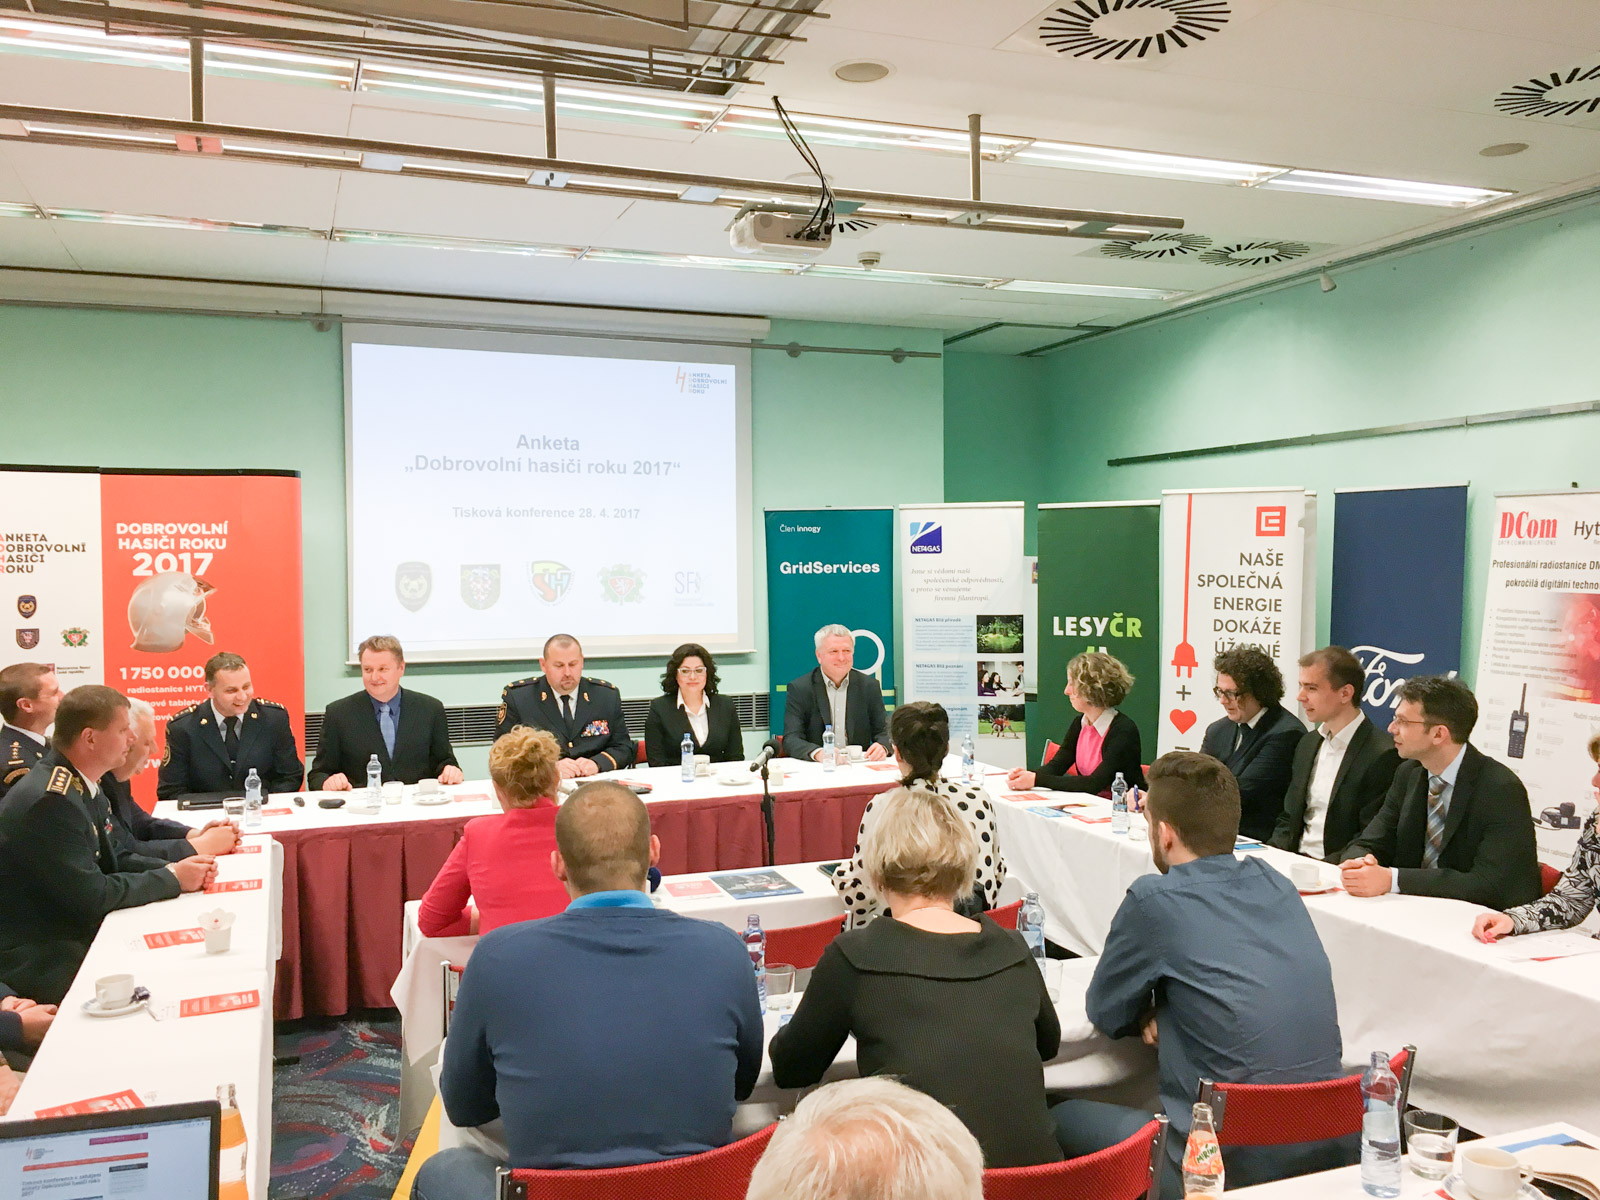 ilona-cssakova-tiskova-konference-zahajeni-adhr-2017